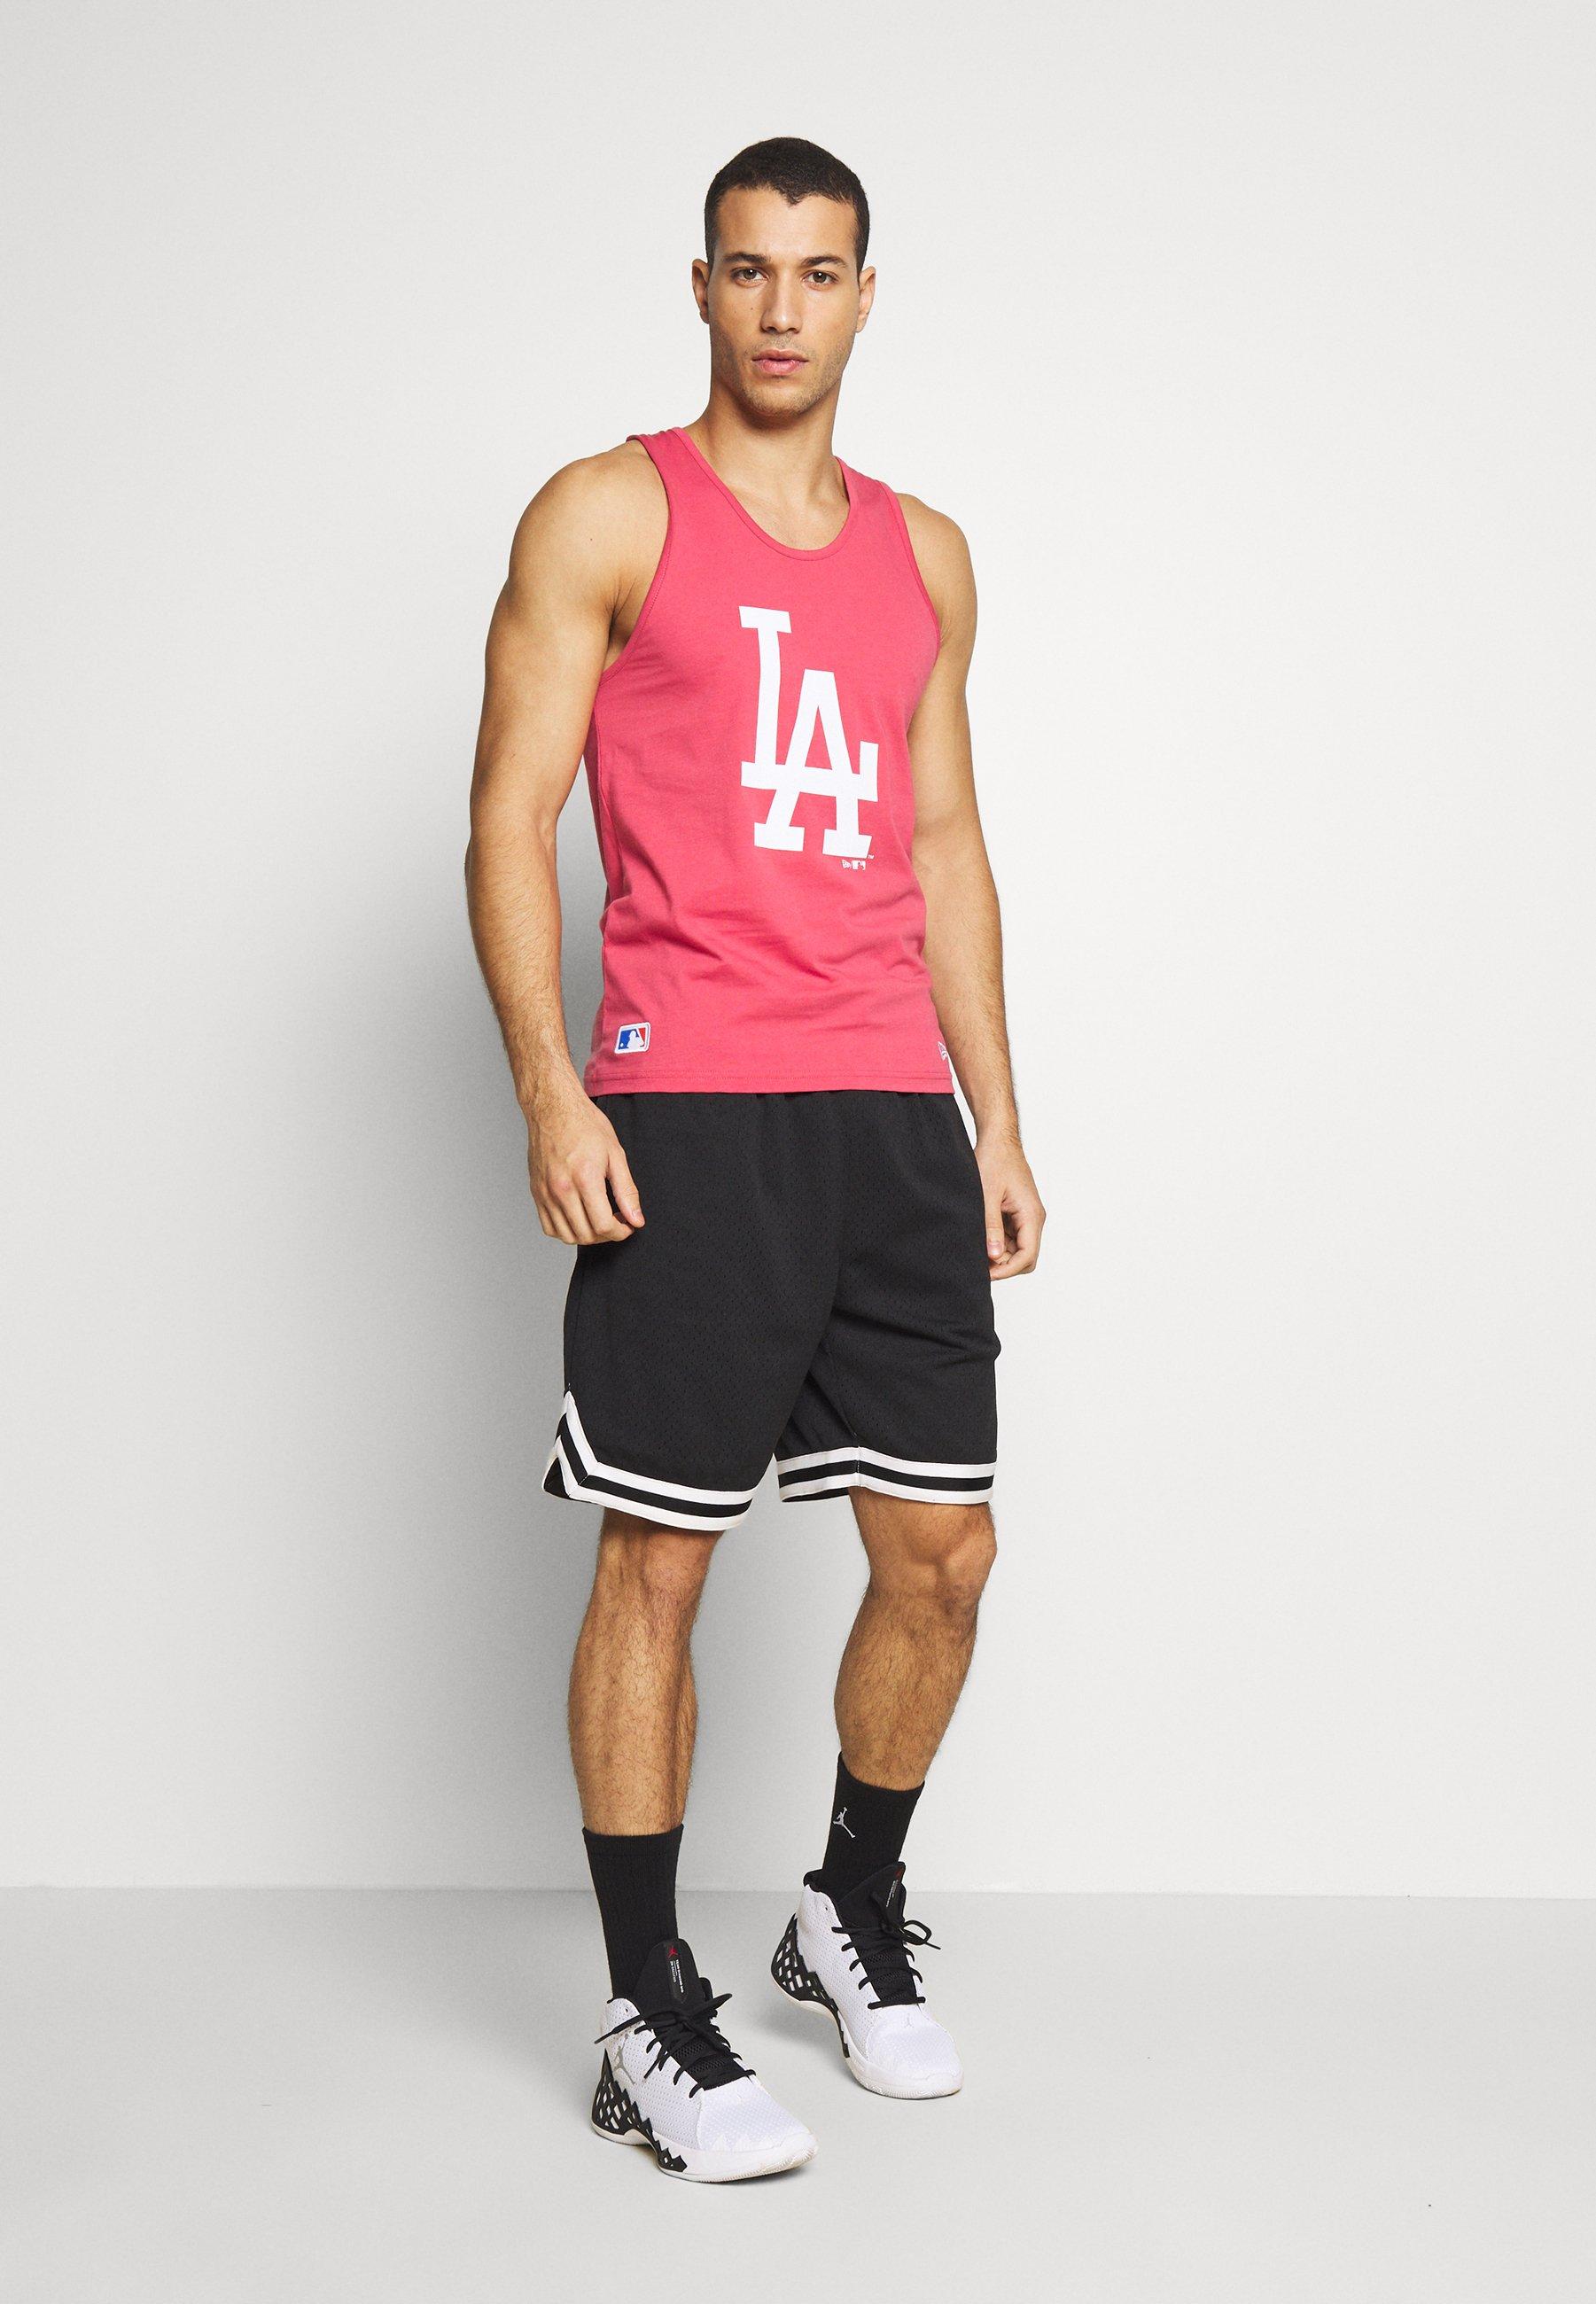 MLB SEASONAL TEAM LOGO TANK LOS ANGELES DODGERS Klubtrøjer light pink